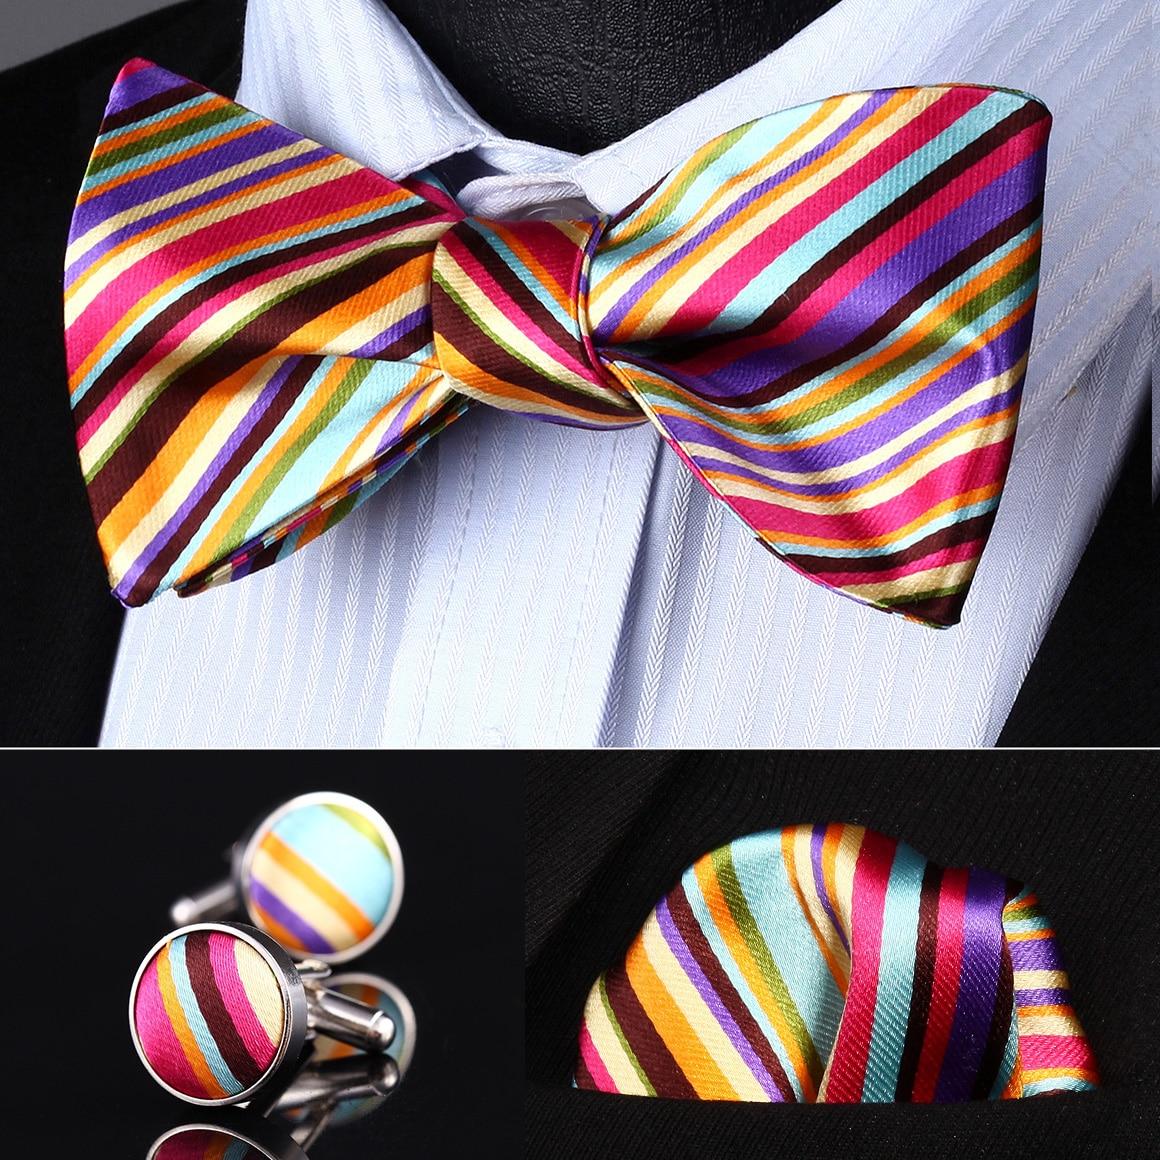 Pocket Square Classic Party Wedding BZS02N Orange Pink Striped Men Silk Self Bow Tie handkerchief Cufflinks set